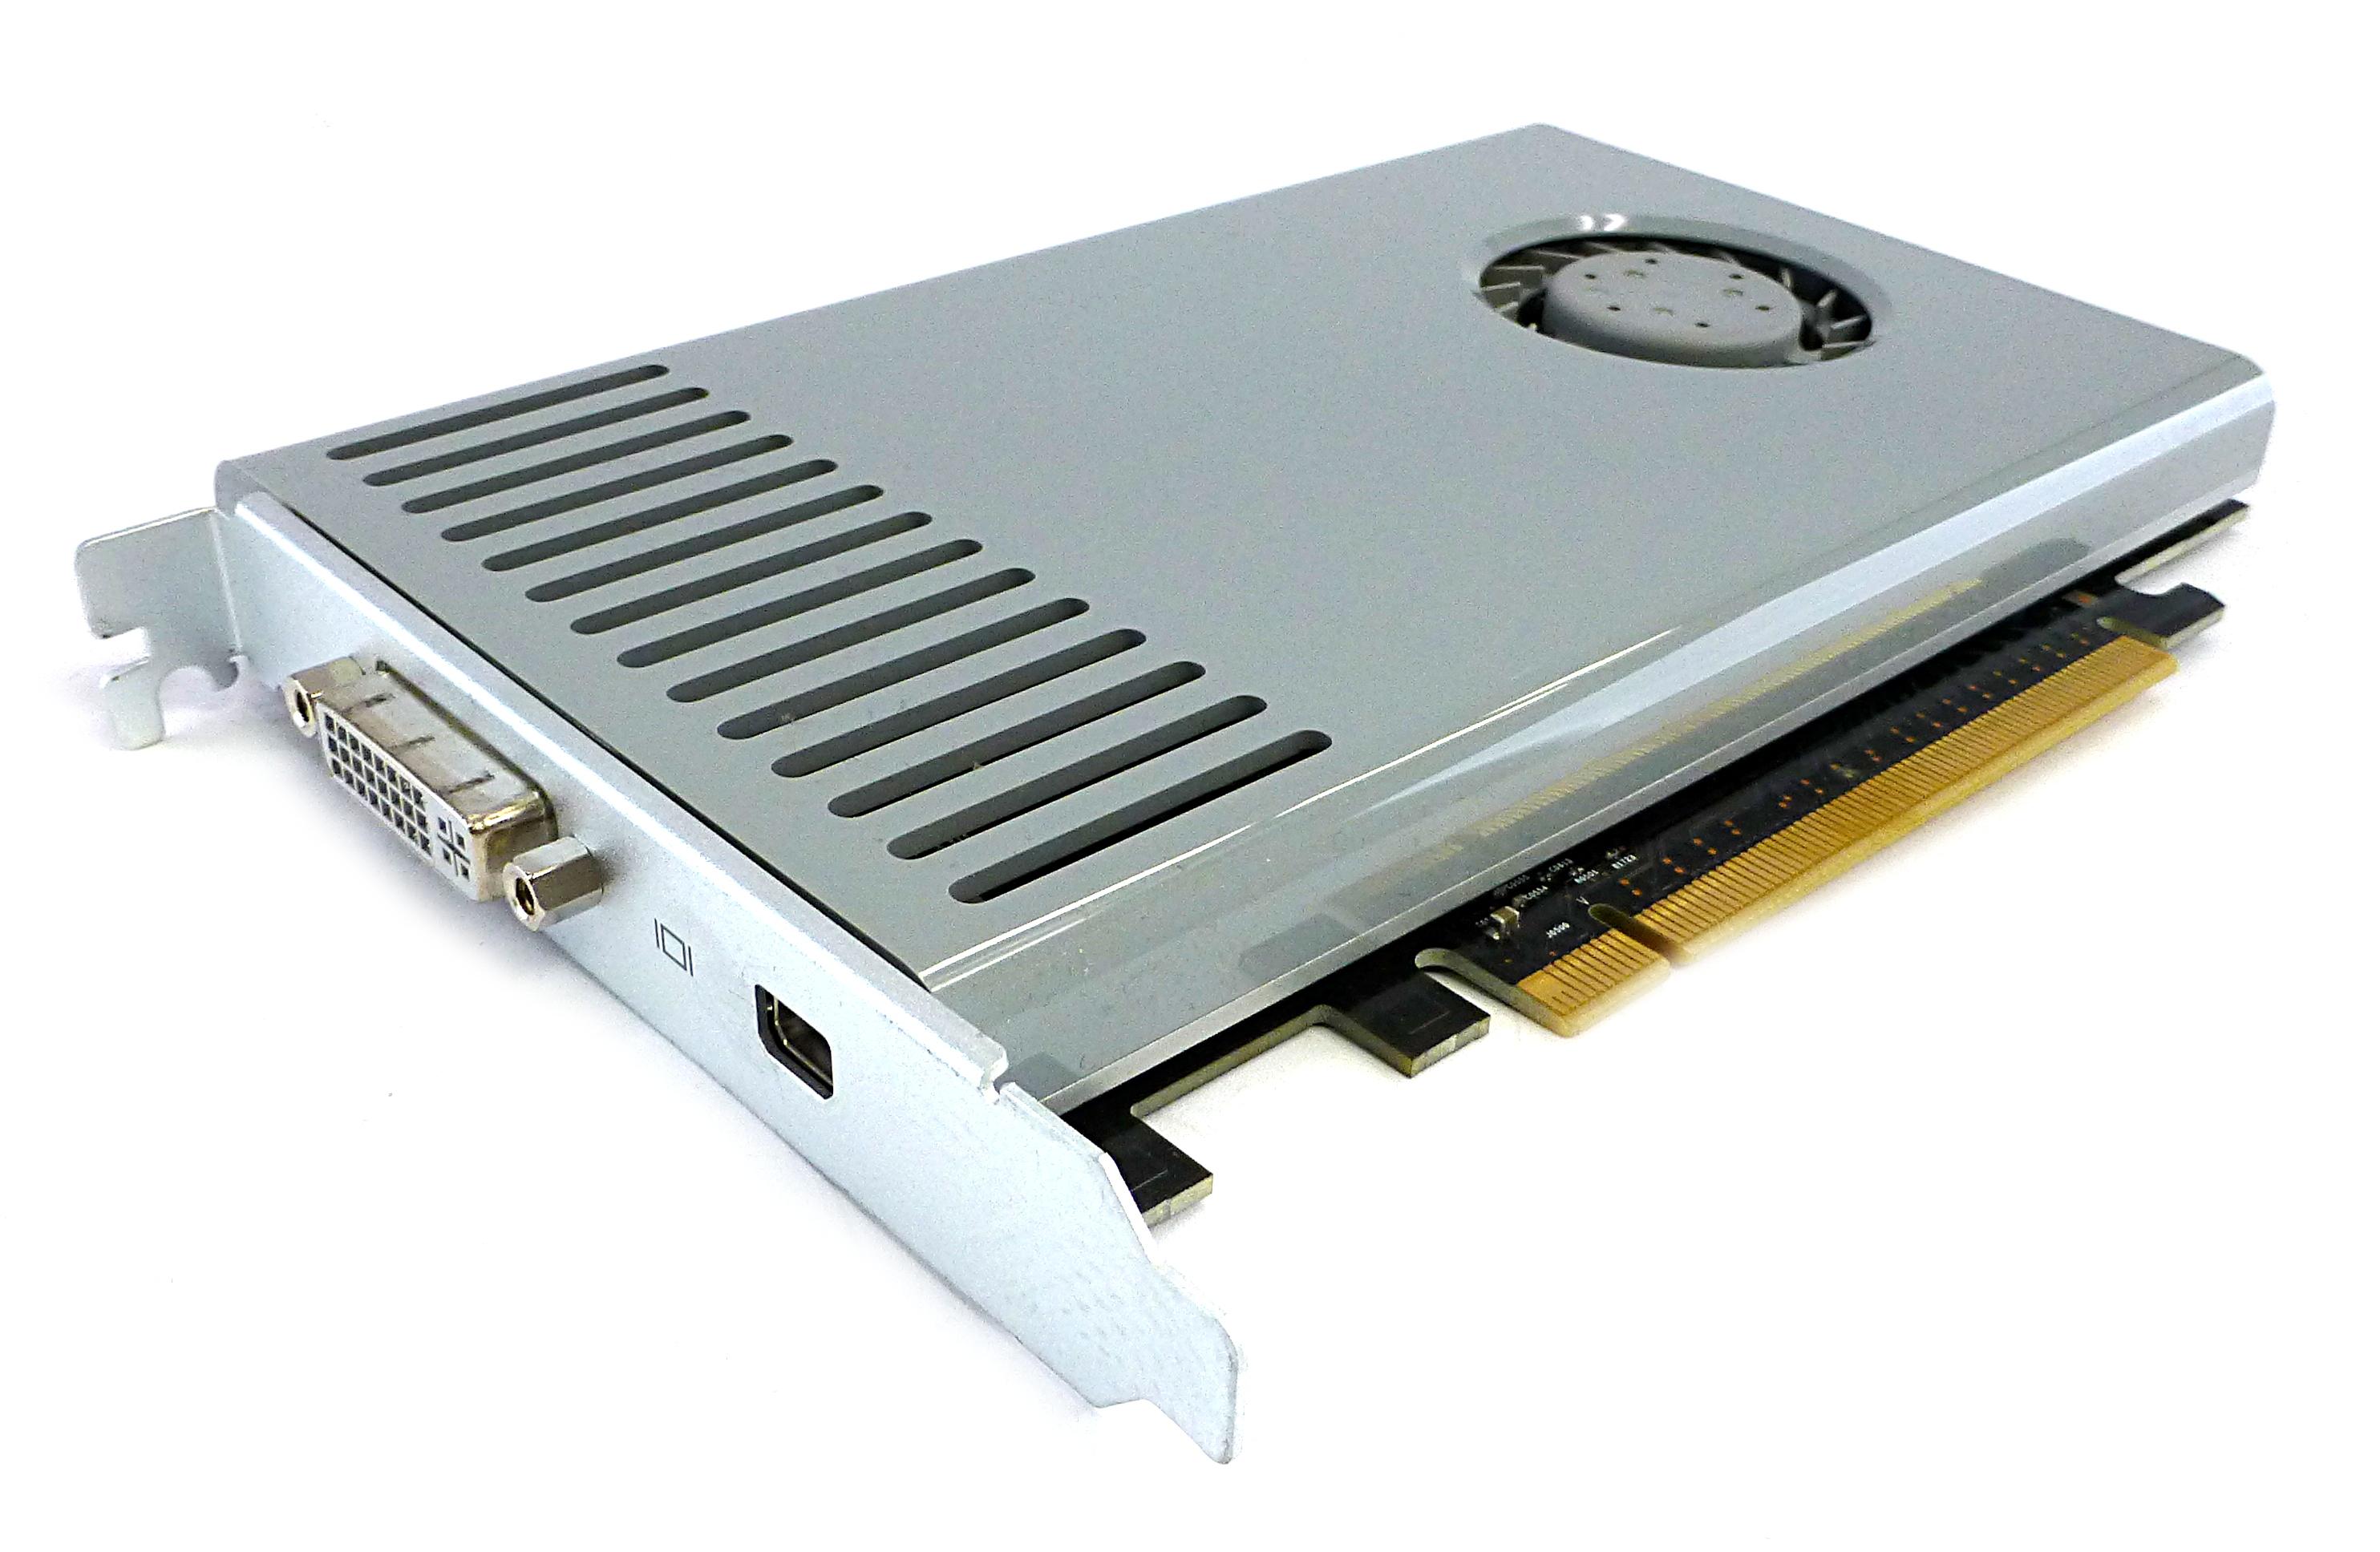 639-0950 Apple Mac Pro NVIDIA GeForce GT120 512Mb Graphics Card A1289 (EMC 2314)